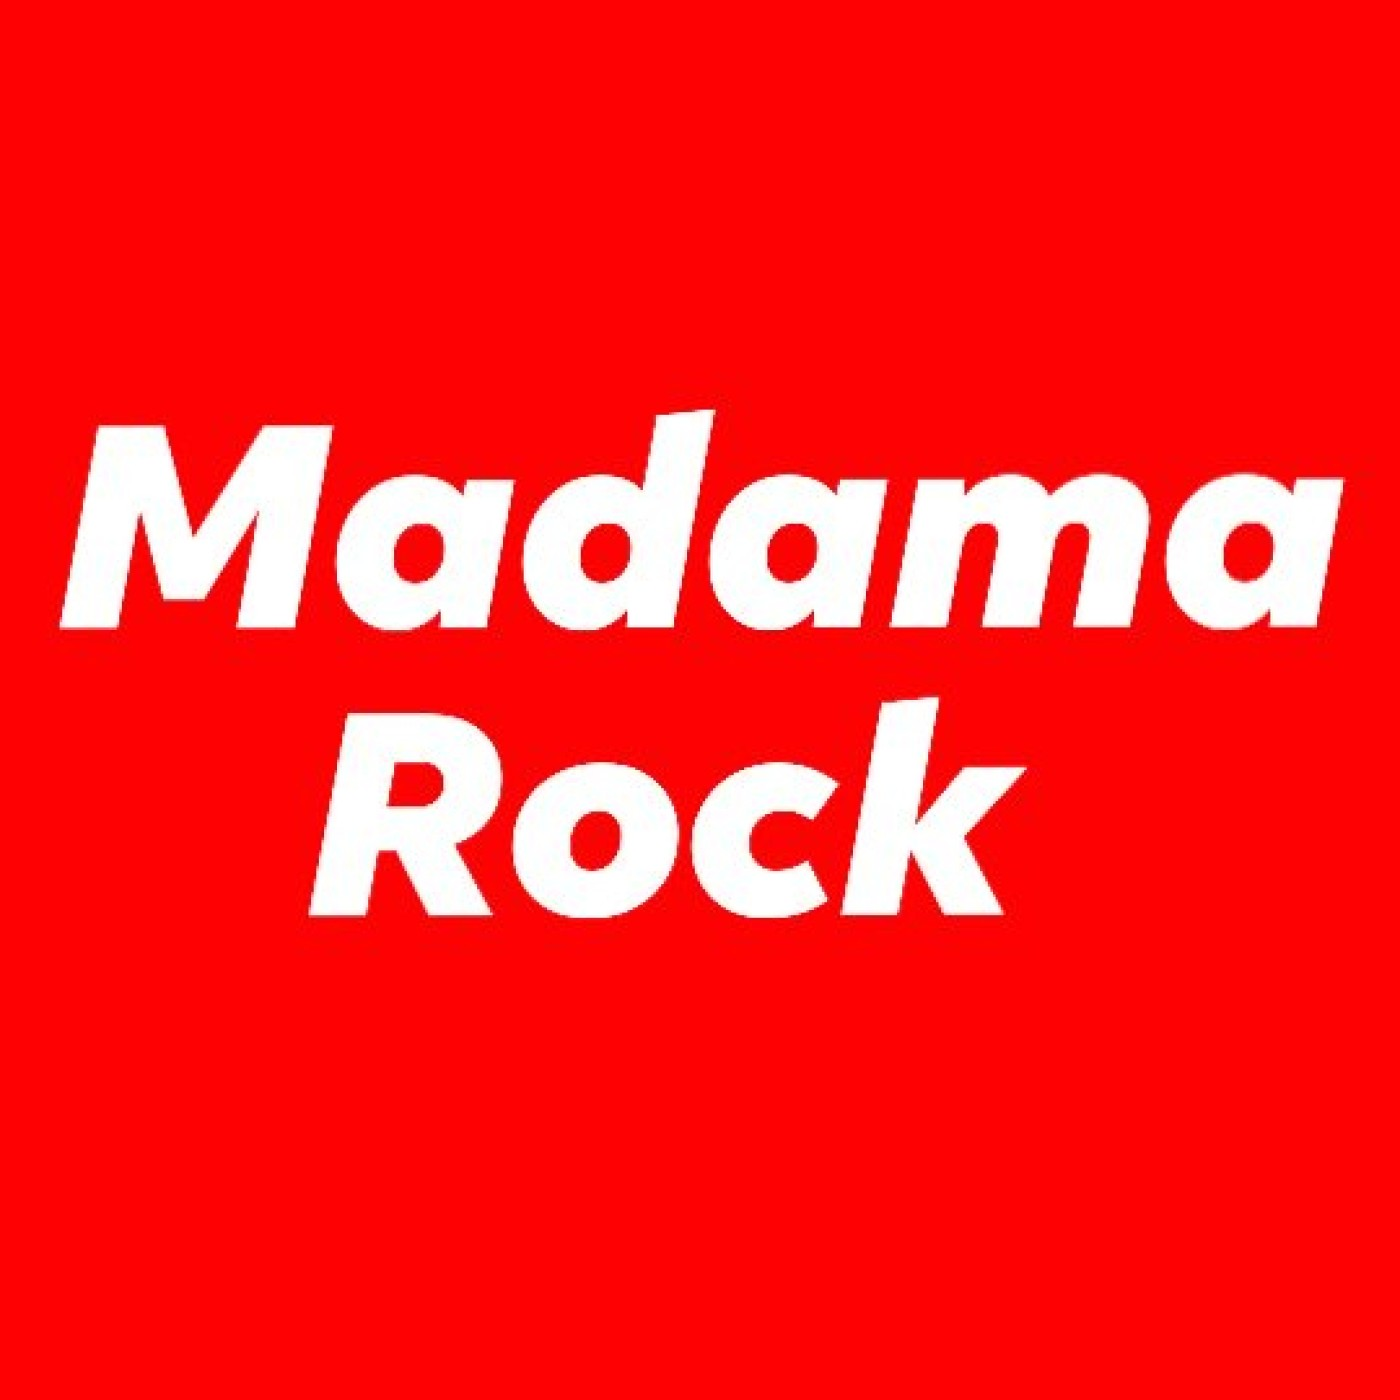 213Rock Madama Rock Harrag Melodica - Doc Olivier - Myriam Bahri - 17 02 2020